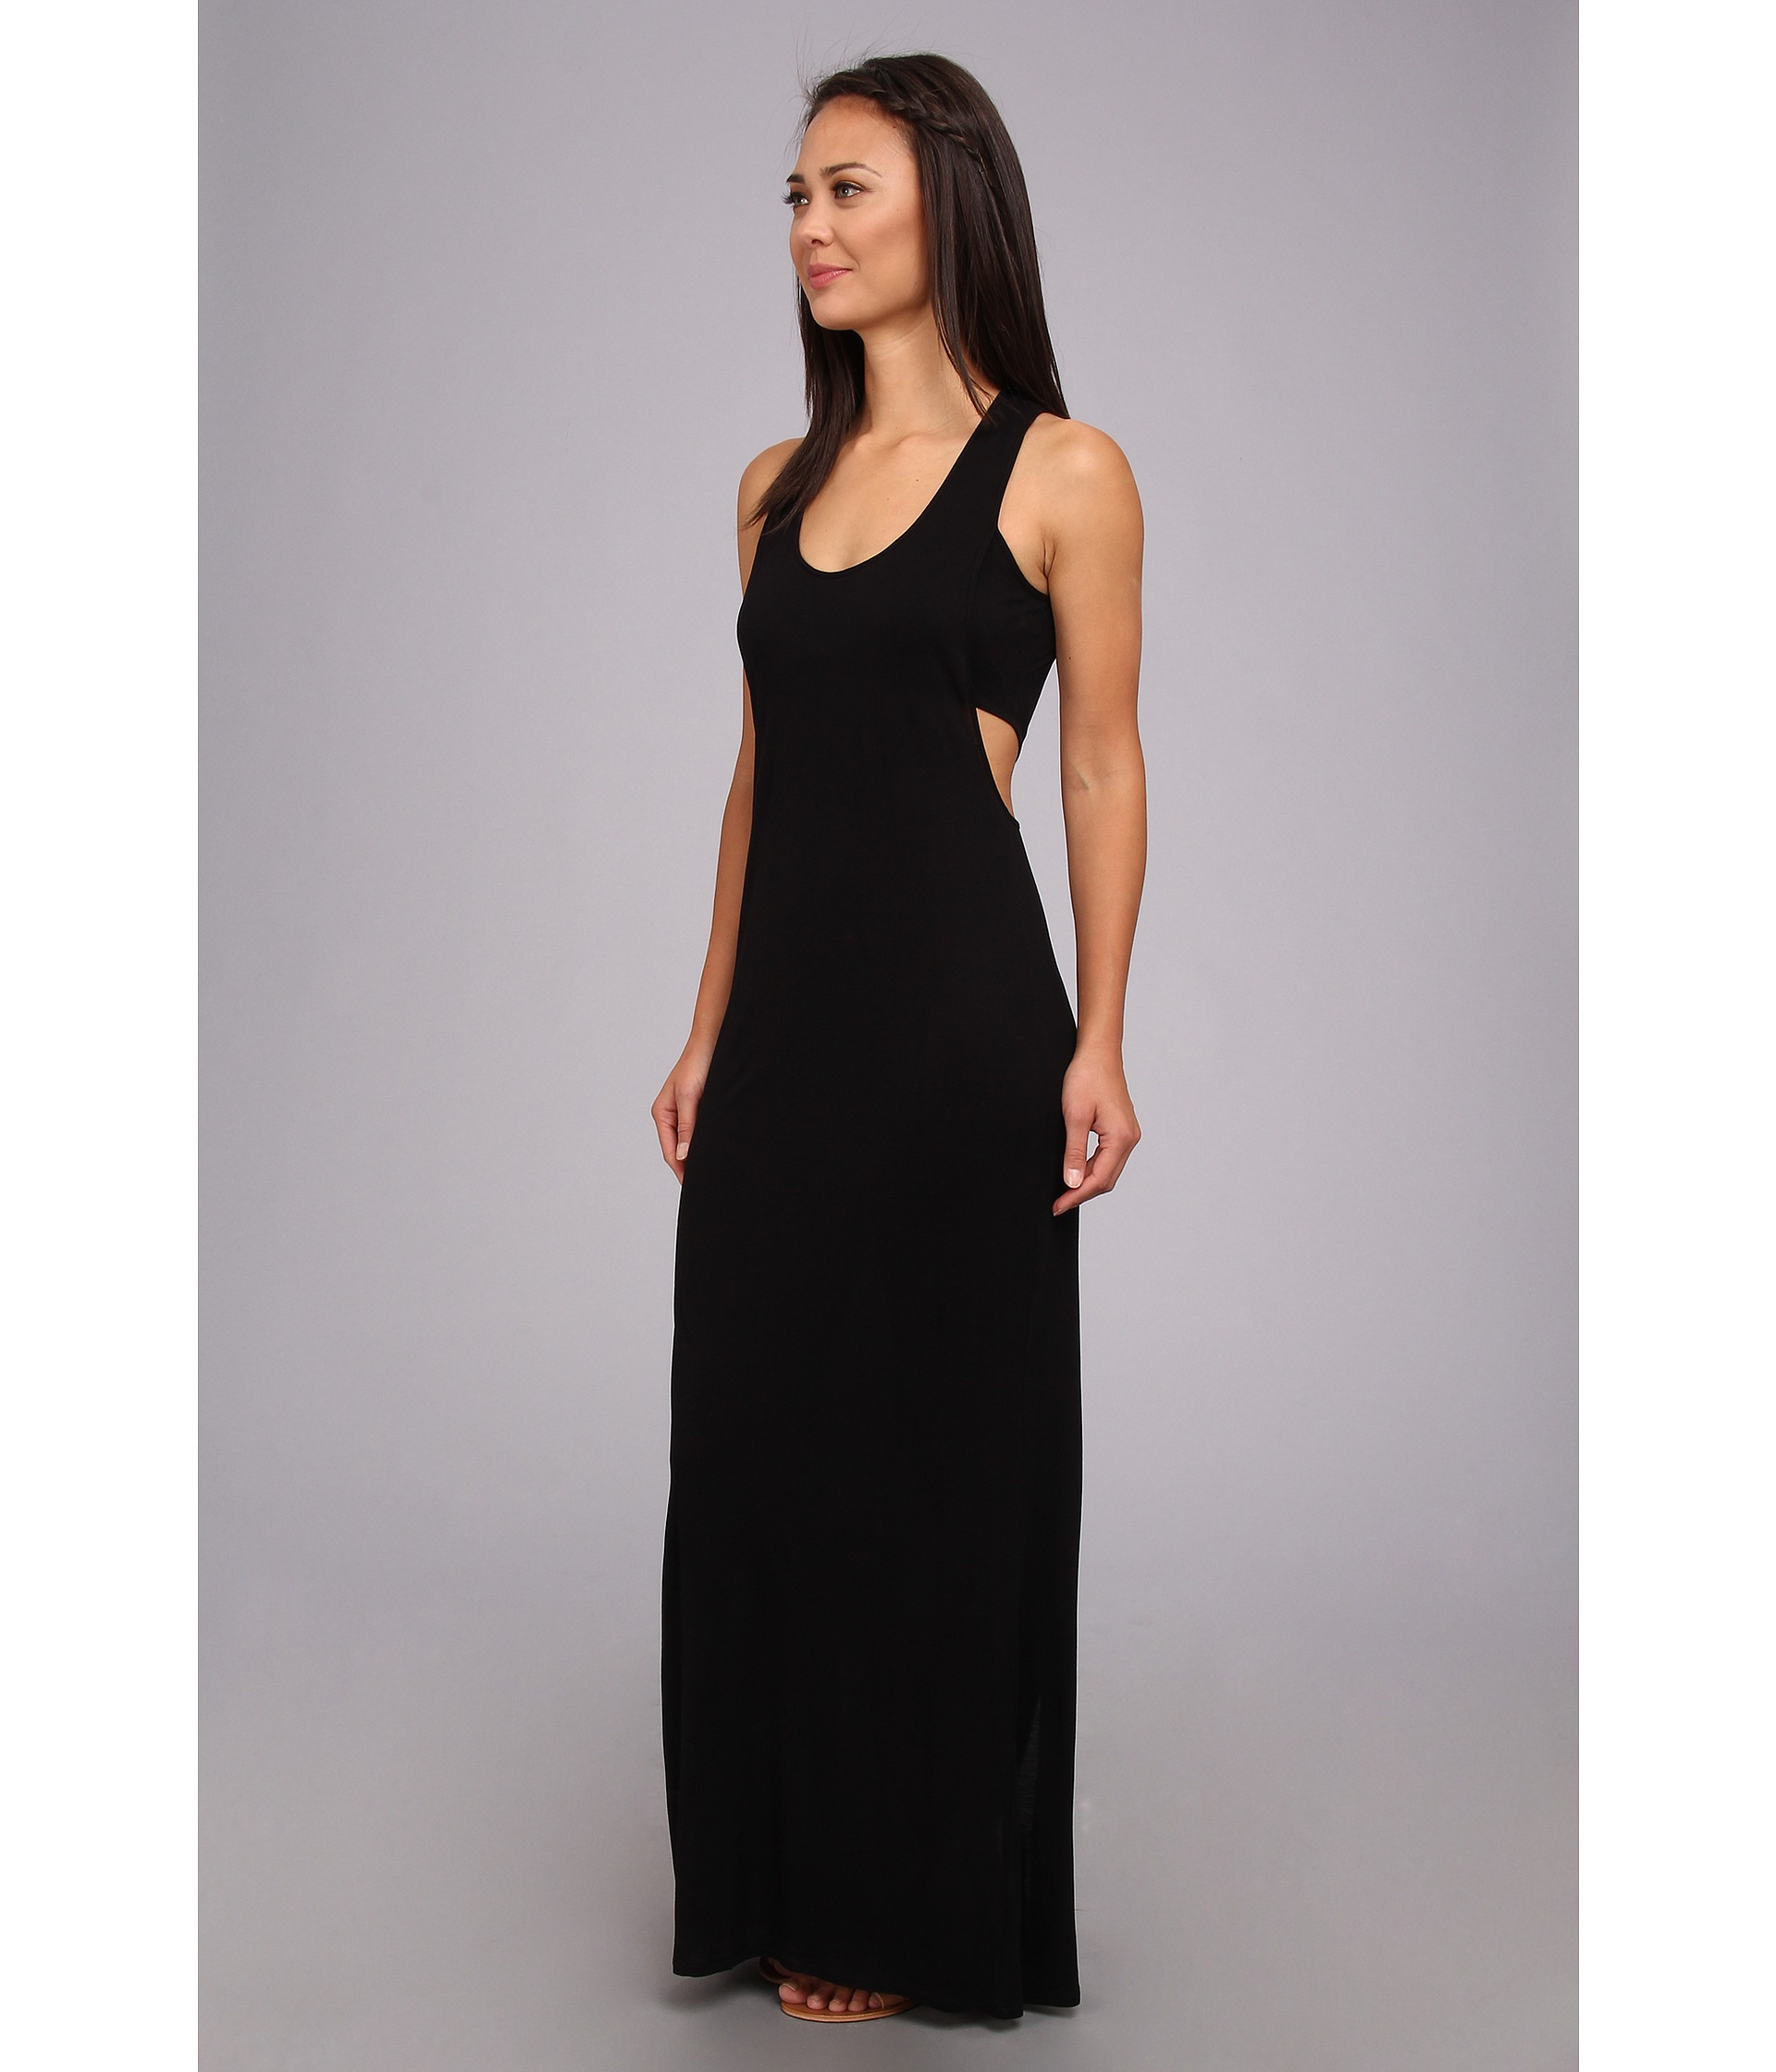 Black black t shirt maxi dress - Bcbgeneration Black T Shirt Maxi Dress